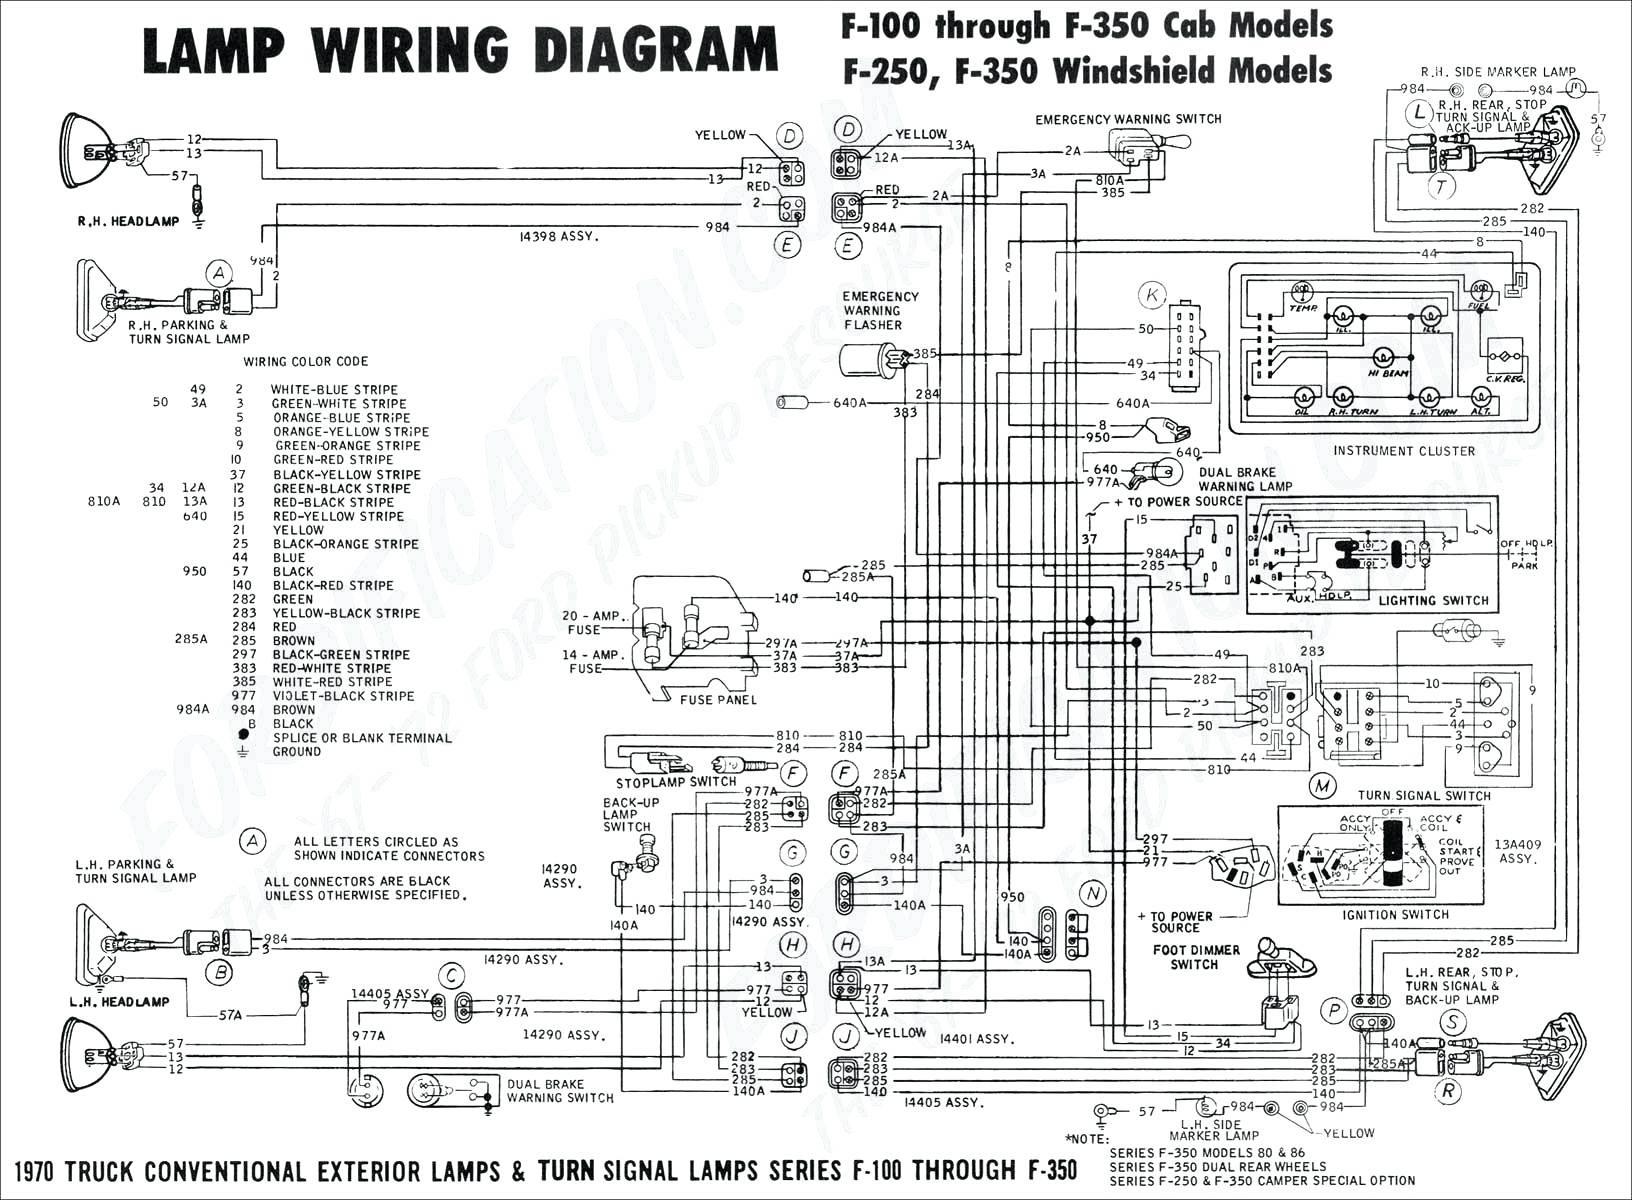 hight resolution of 1996 ford e250 headlight wiring data wiring diagrams u2022 rh 45 77 211 17 93 ford